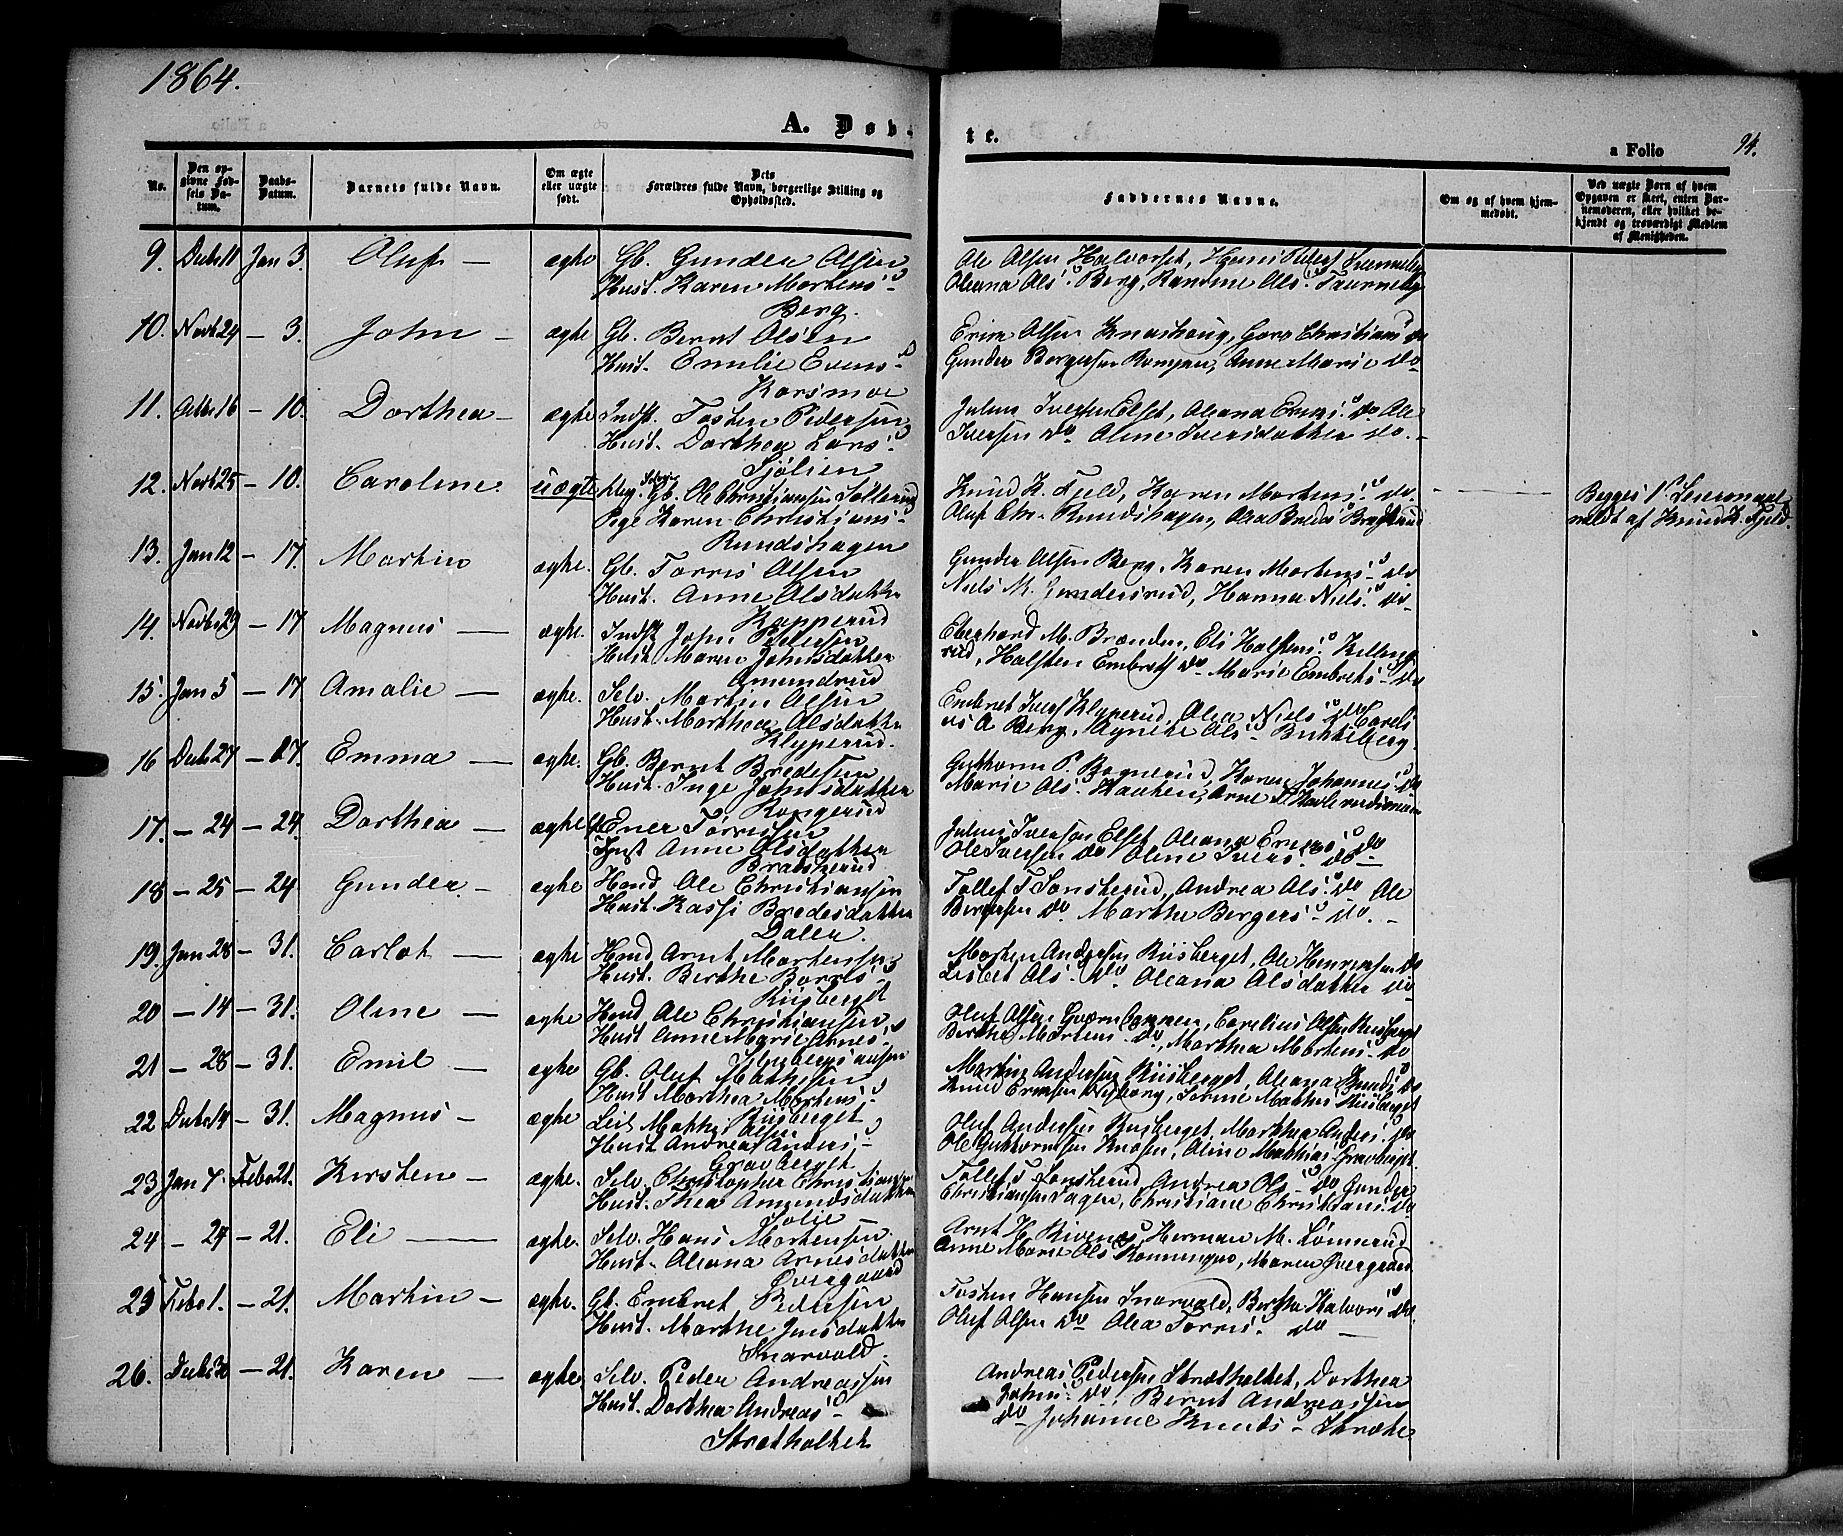 SAH, Våler prestekontor, Ministerialbok nr. 1, 1849-1878, s. 94